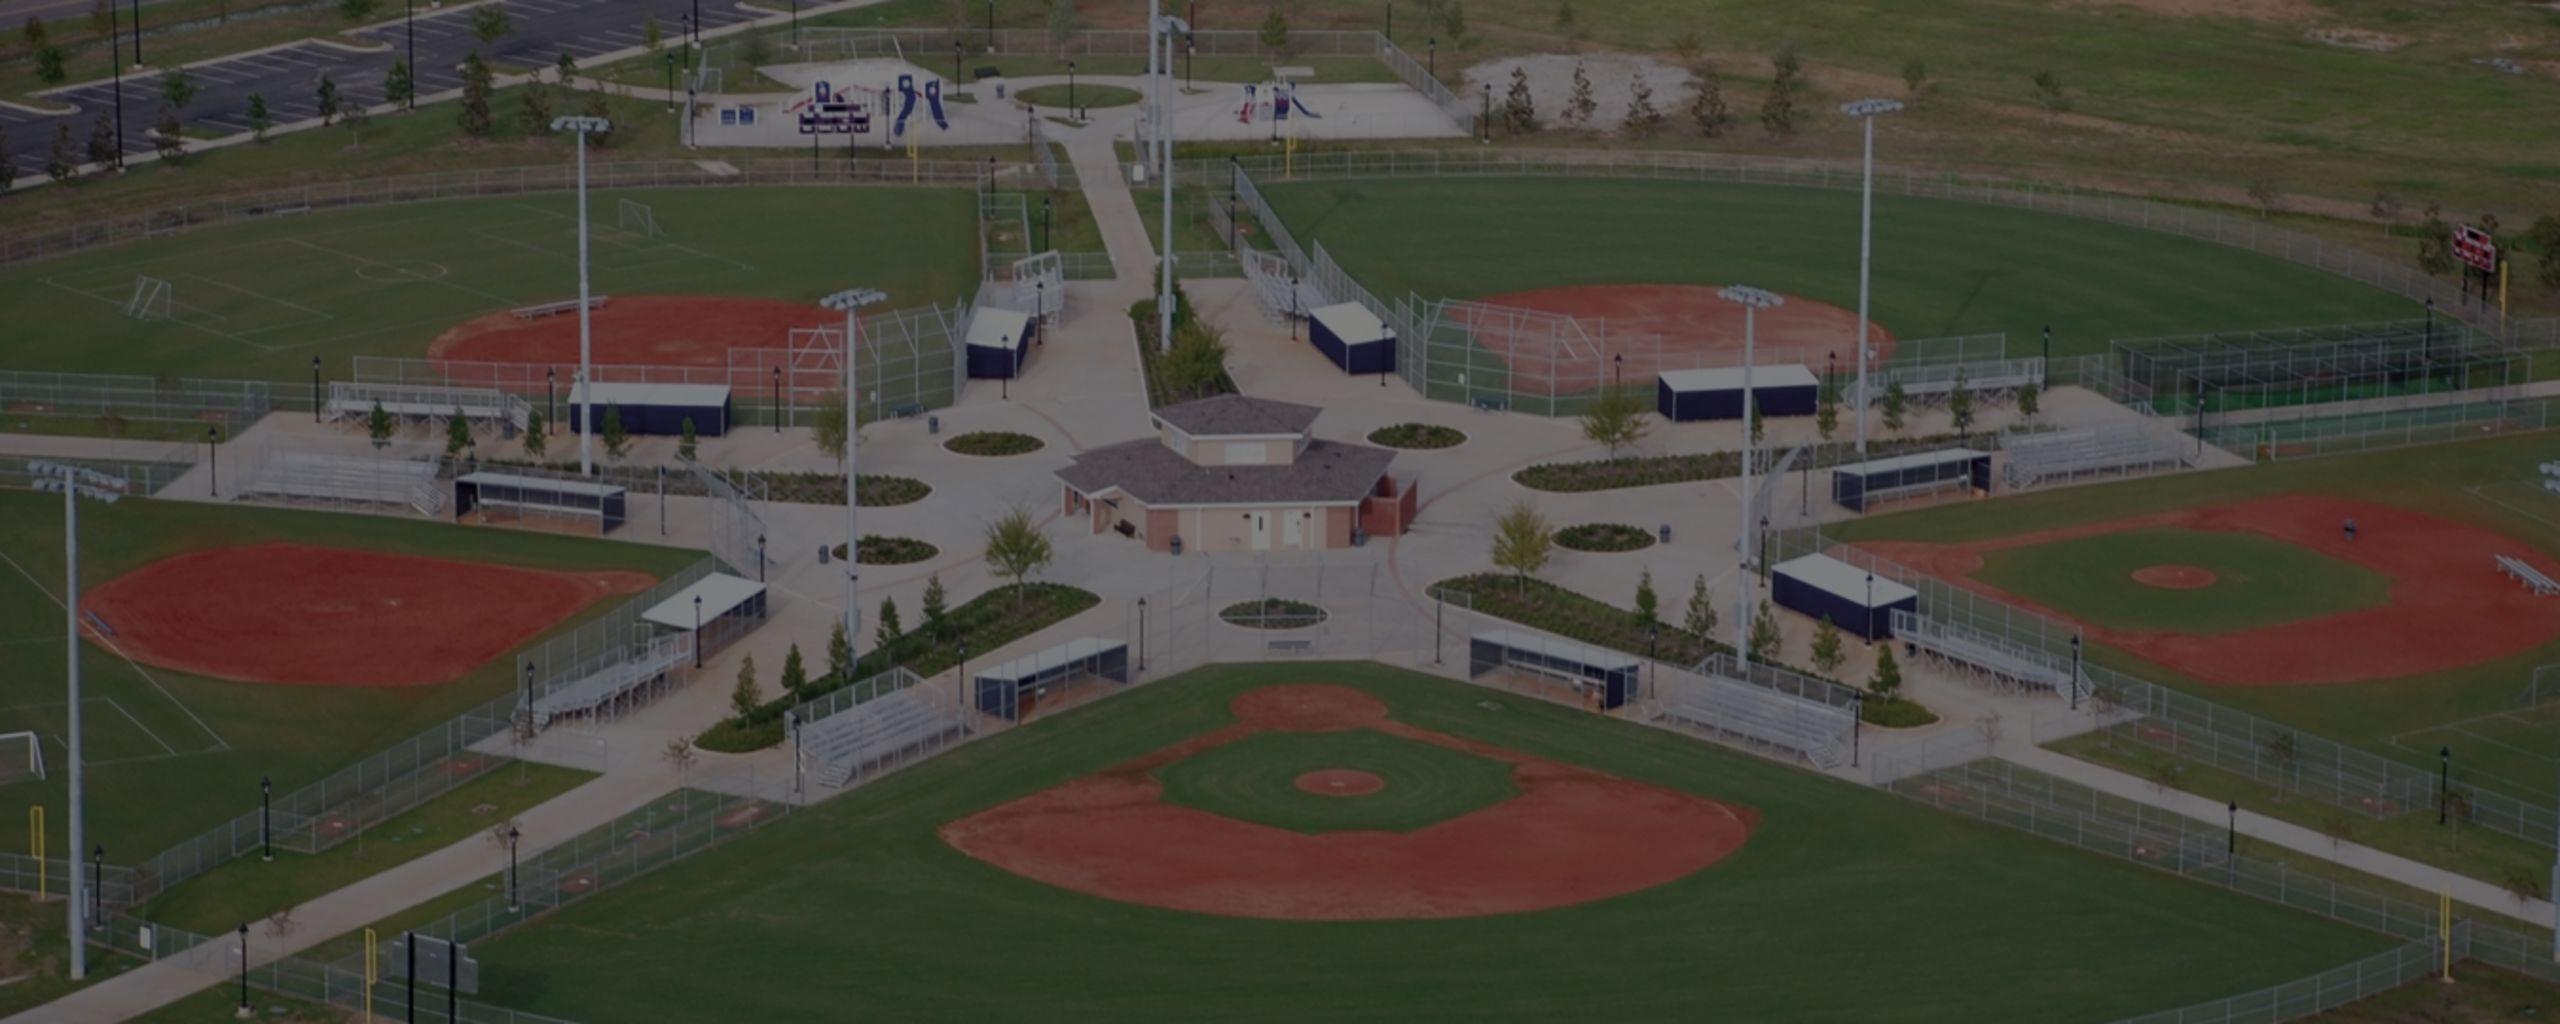 Foley Sports Park